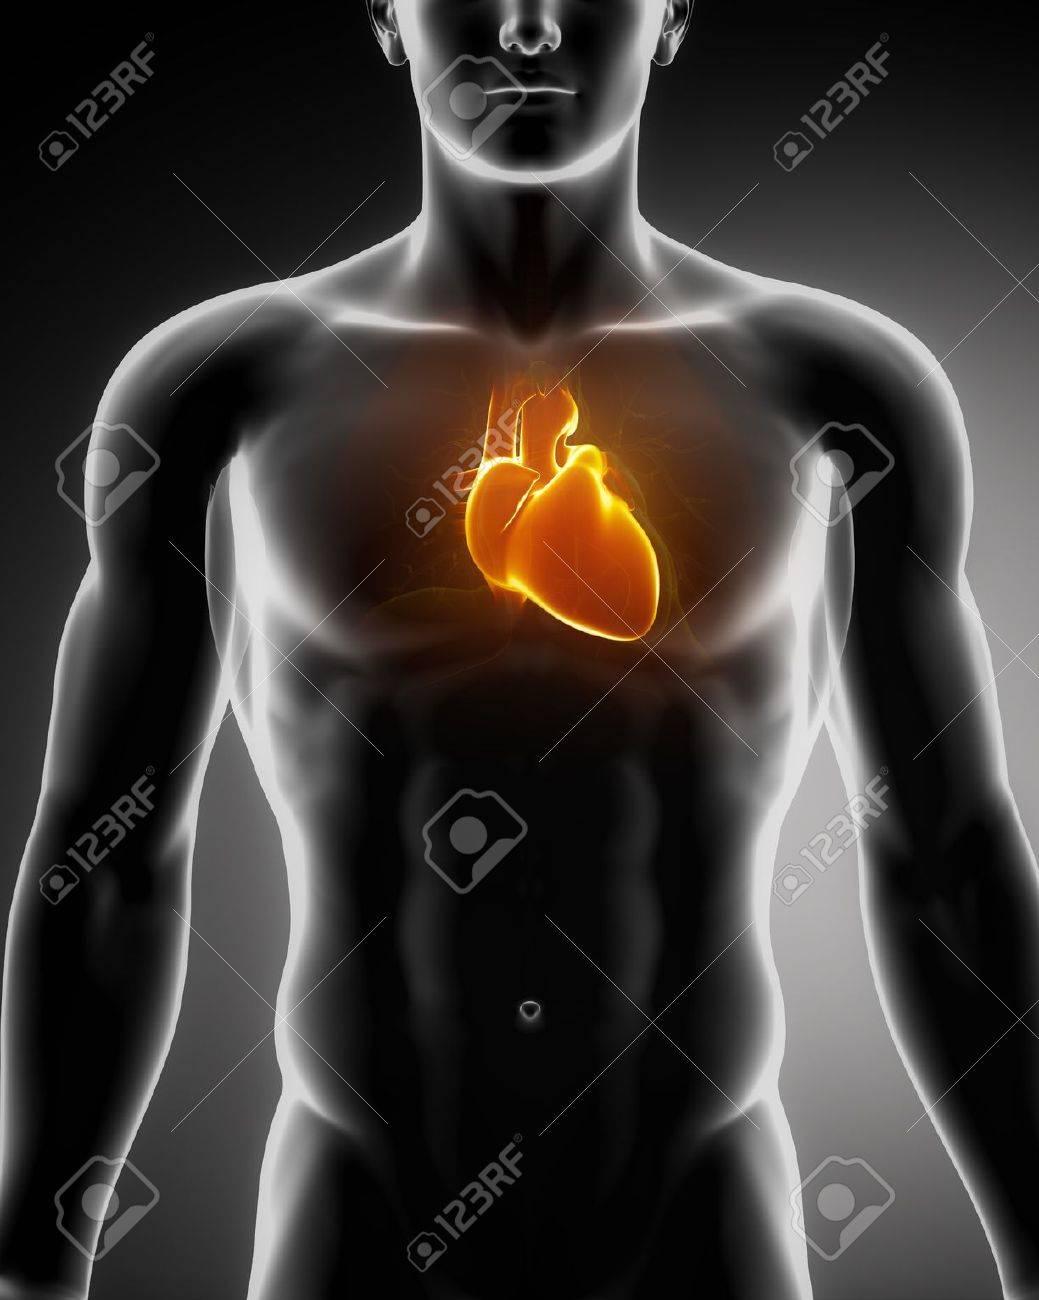 Anatomía Masculina Corazón De órganos Humanos En Vista De Rayos X ...